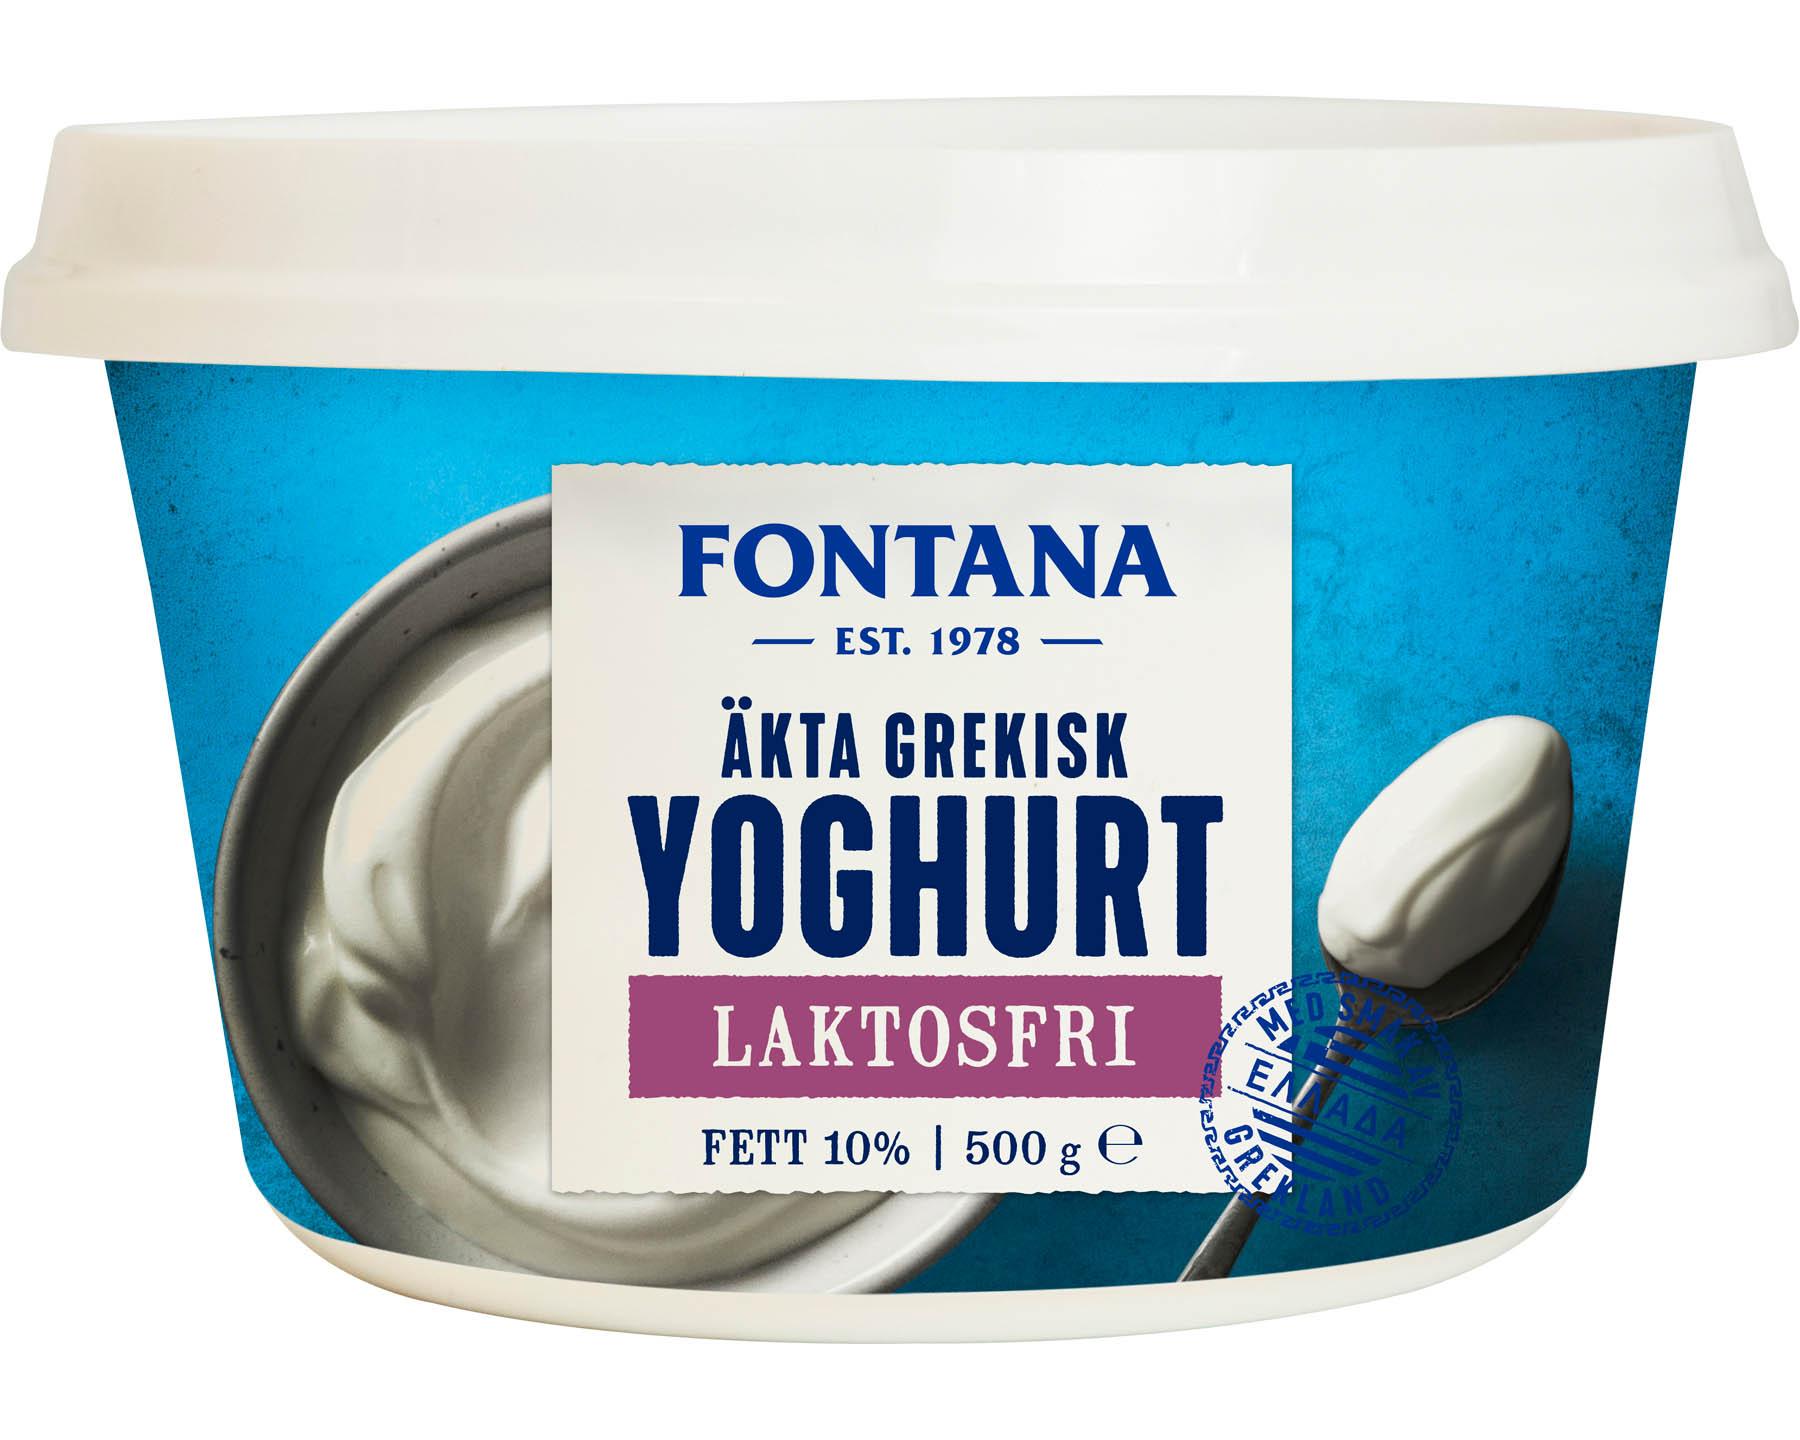 Fontana Äkta Grekisk Yoghurt Laktosfri 10%